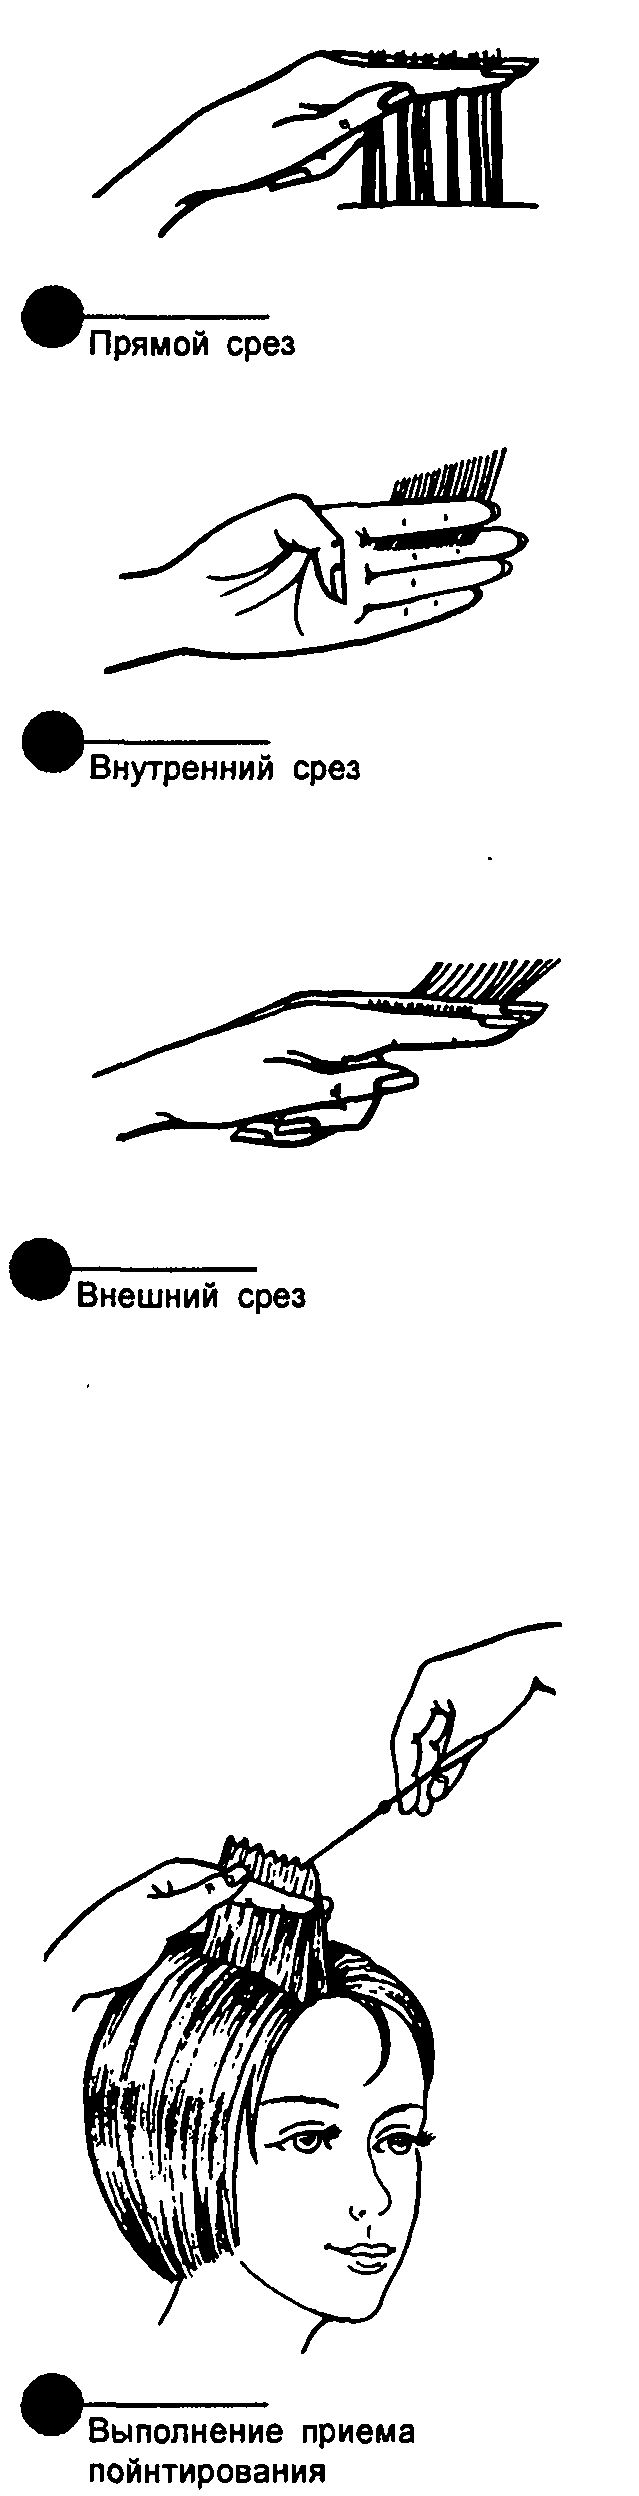 https://klow.ru/images/24112009-21.png